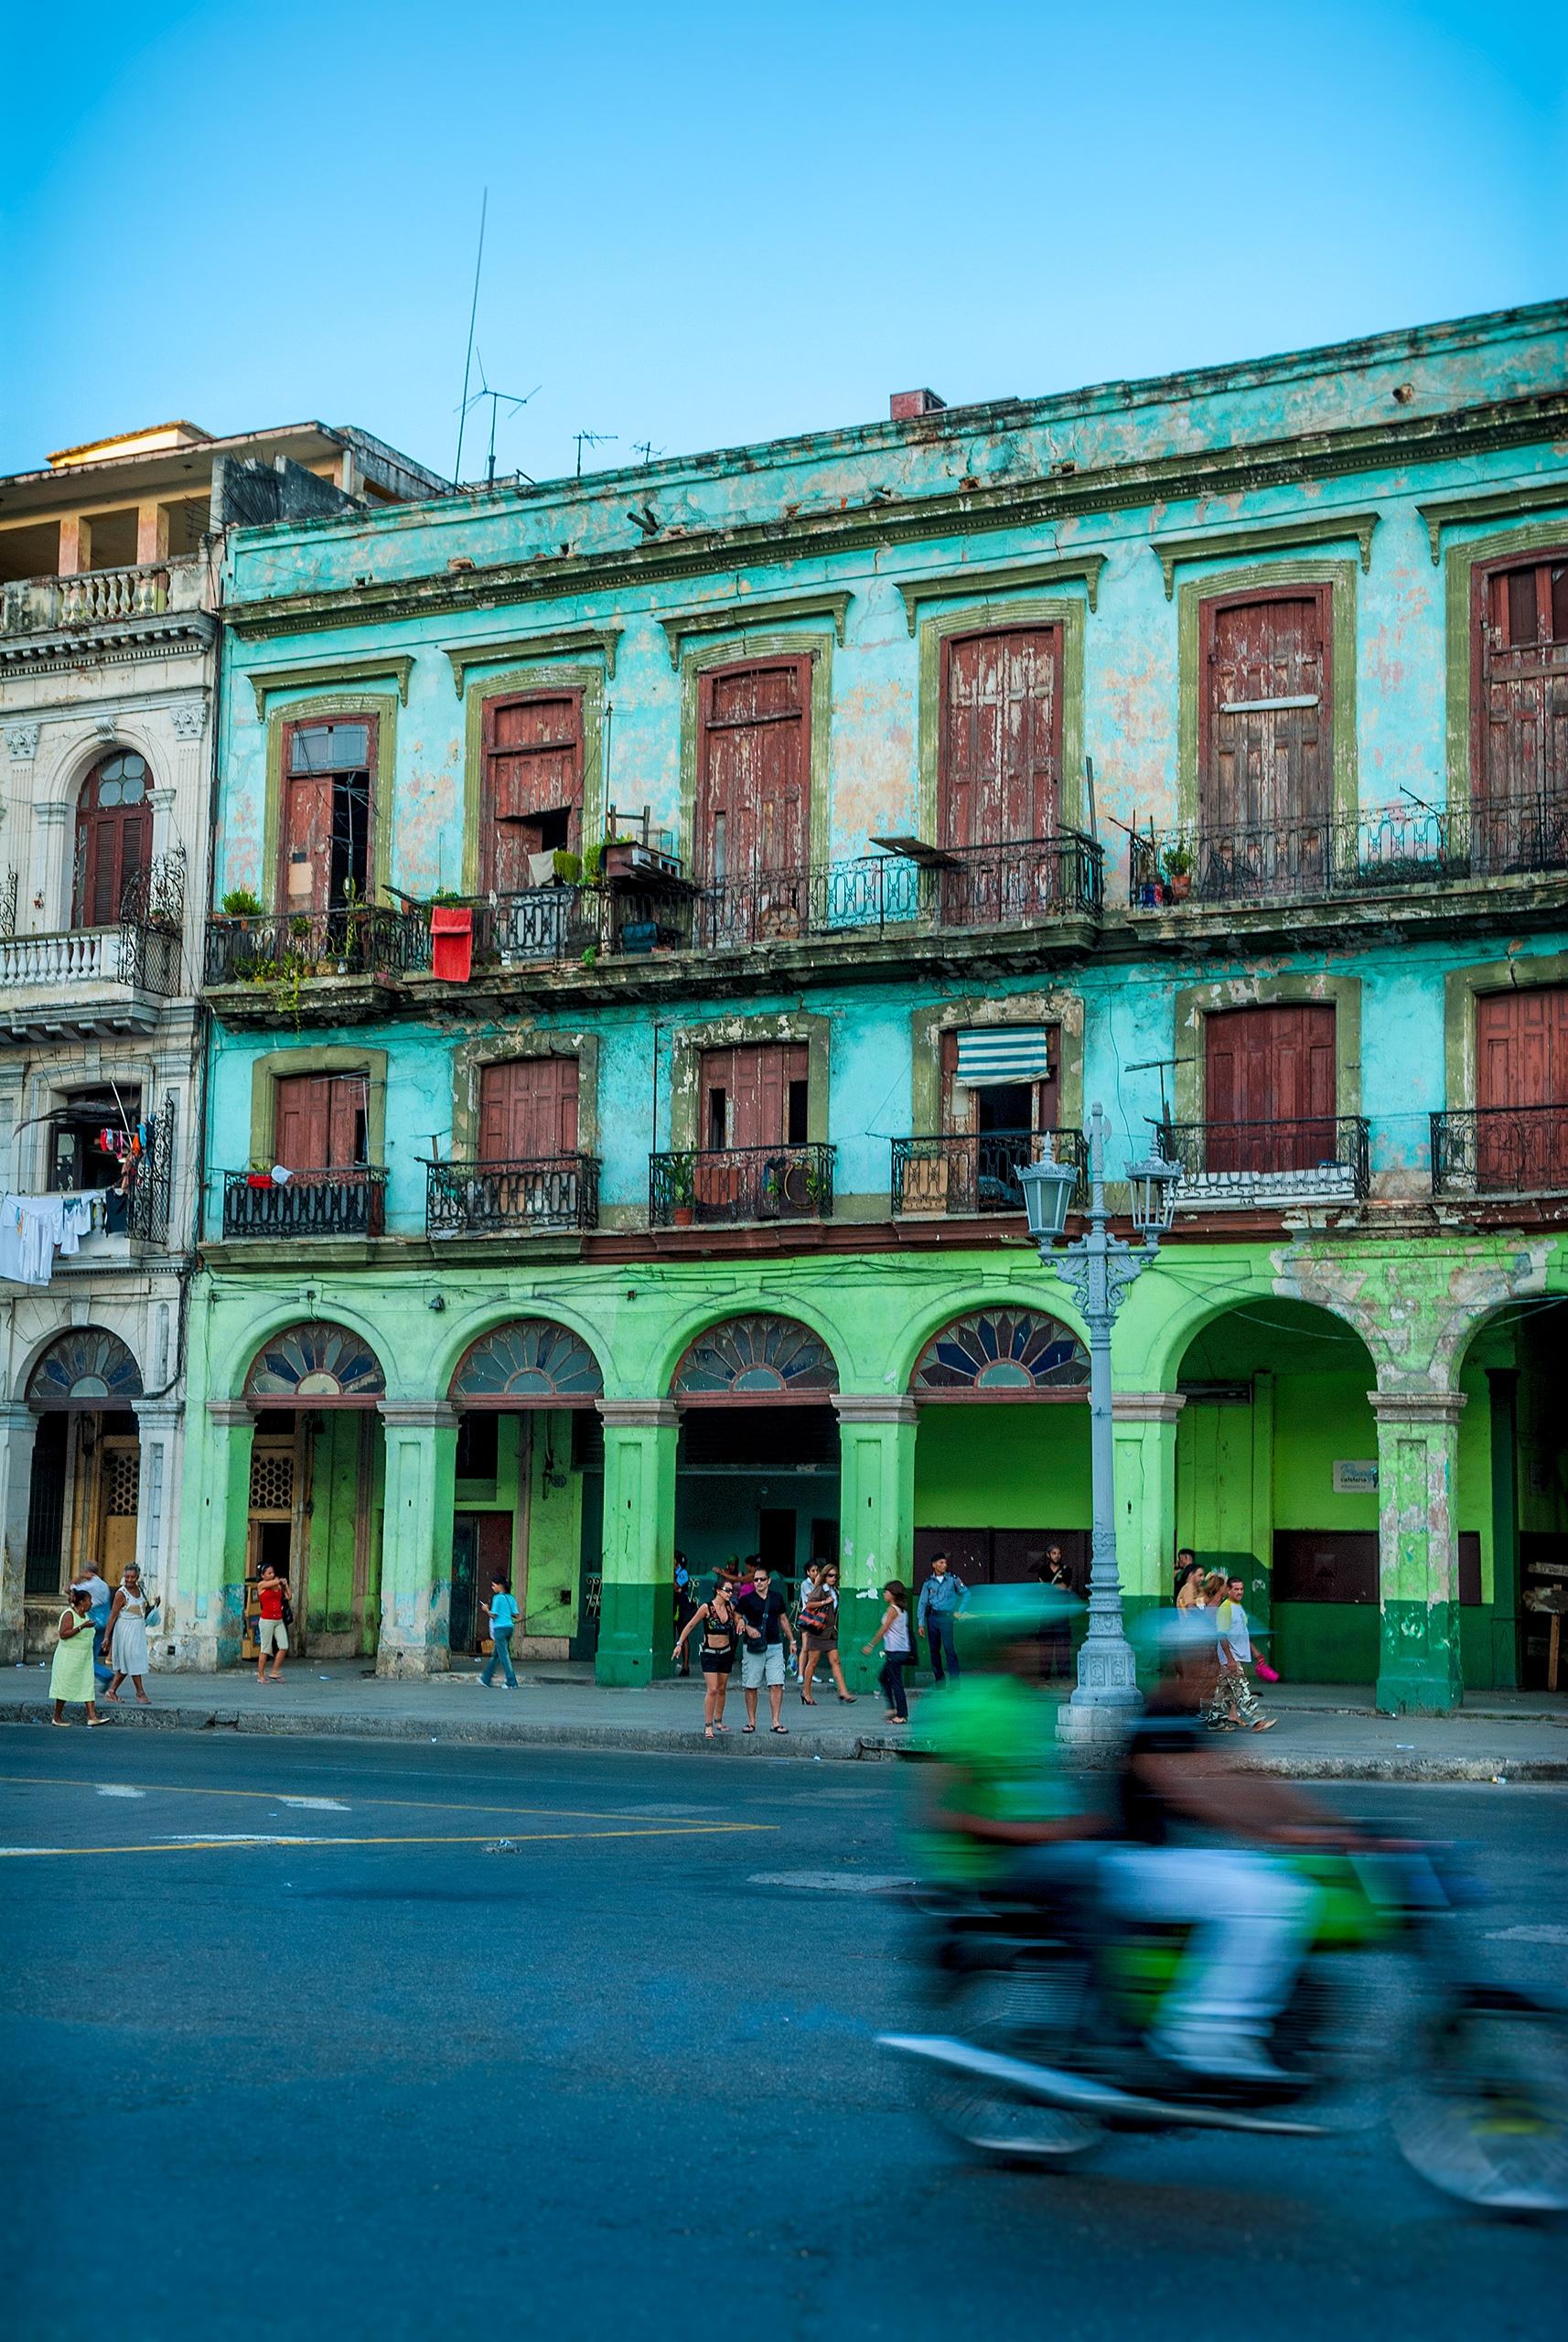 Habana beautiful - Cuba - christofkessemeier | ello